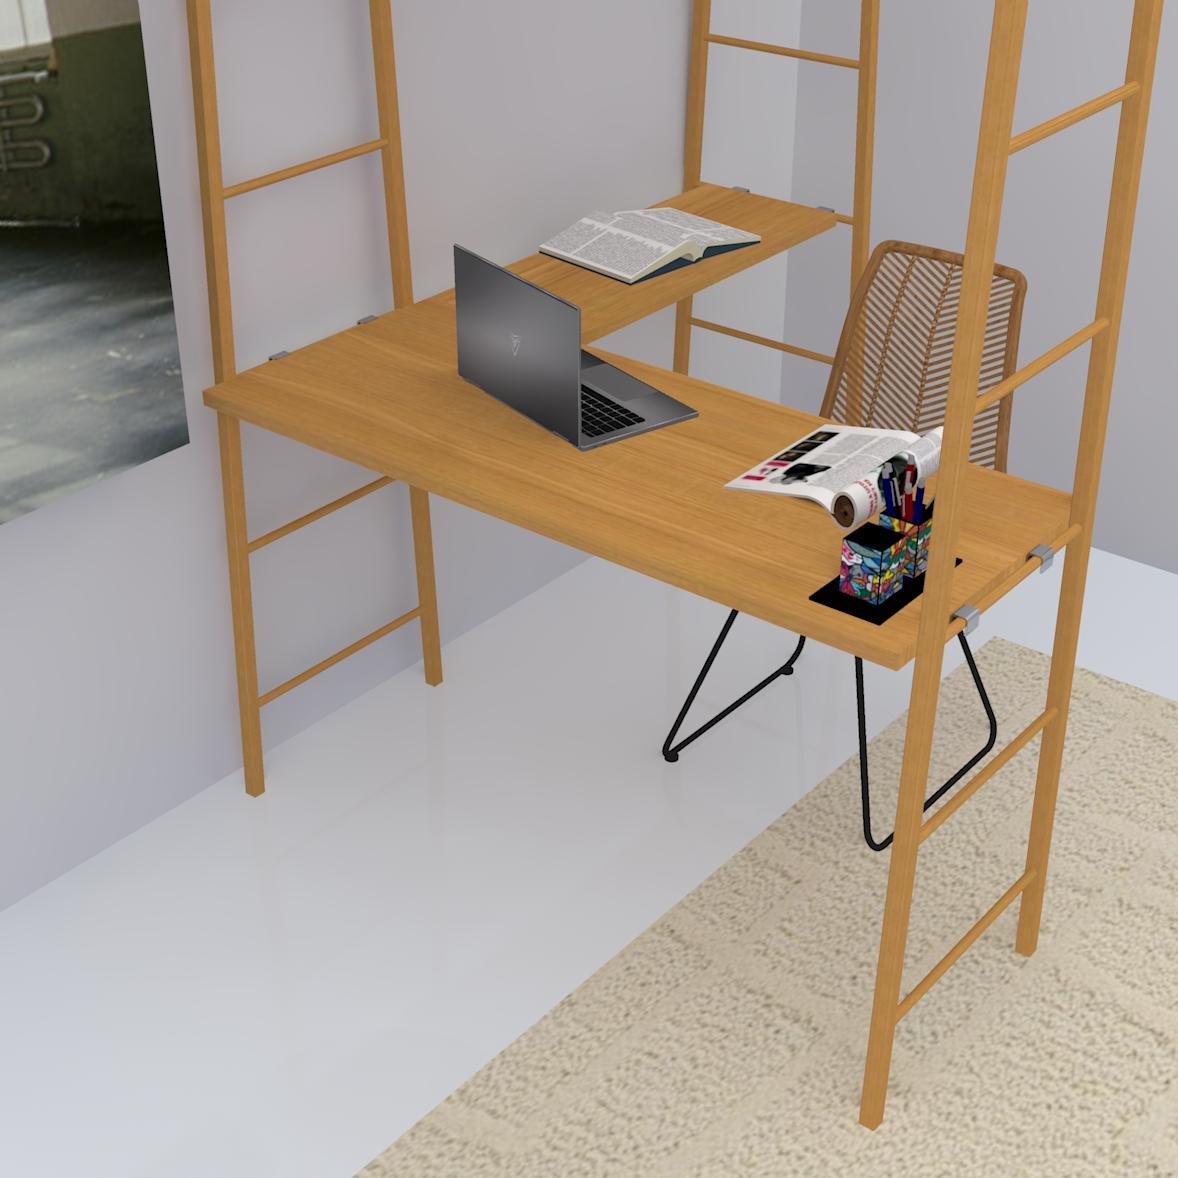 002 office